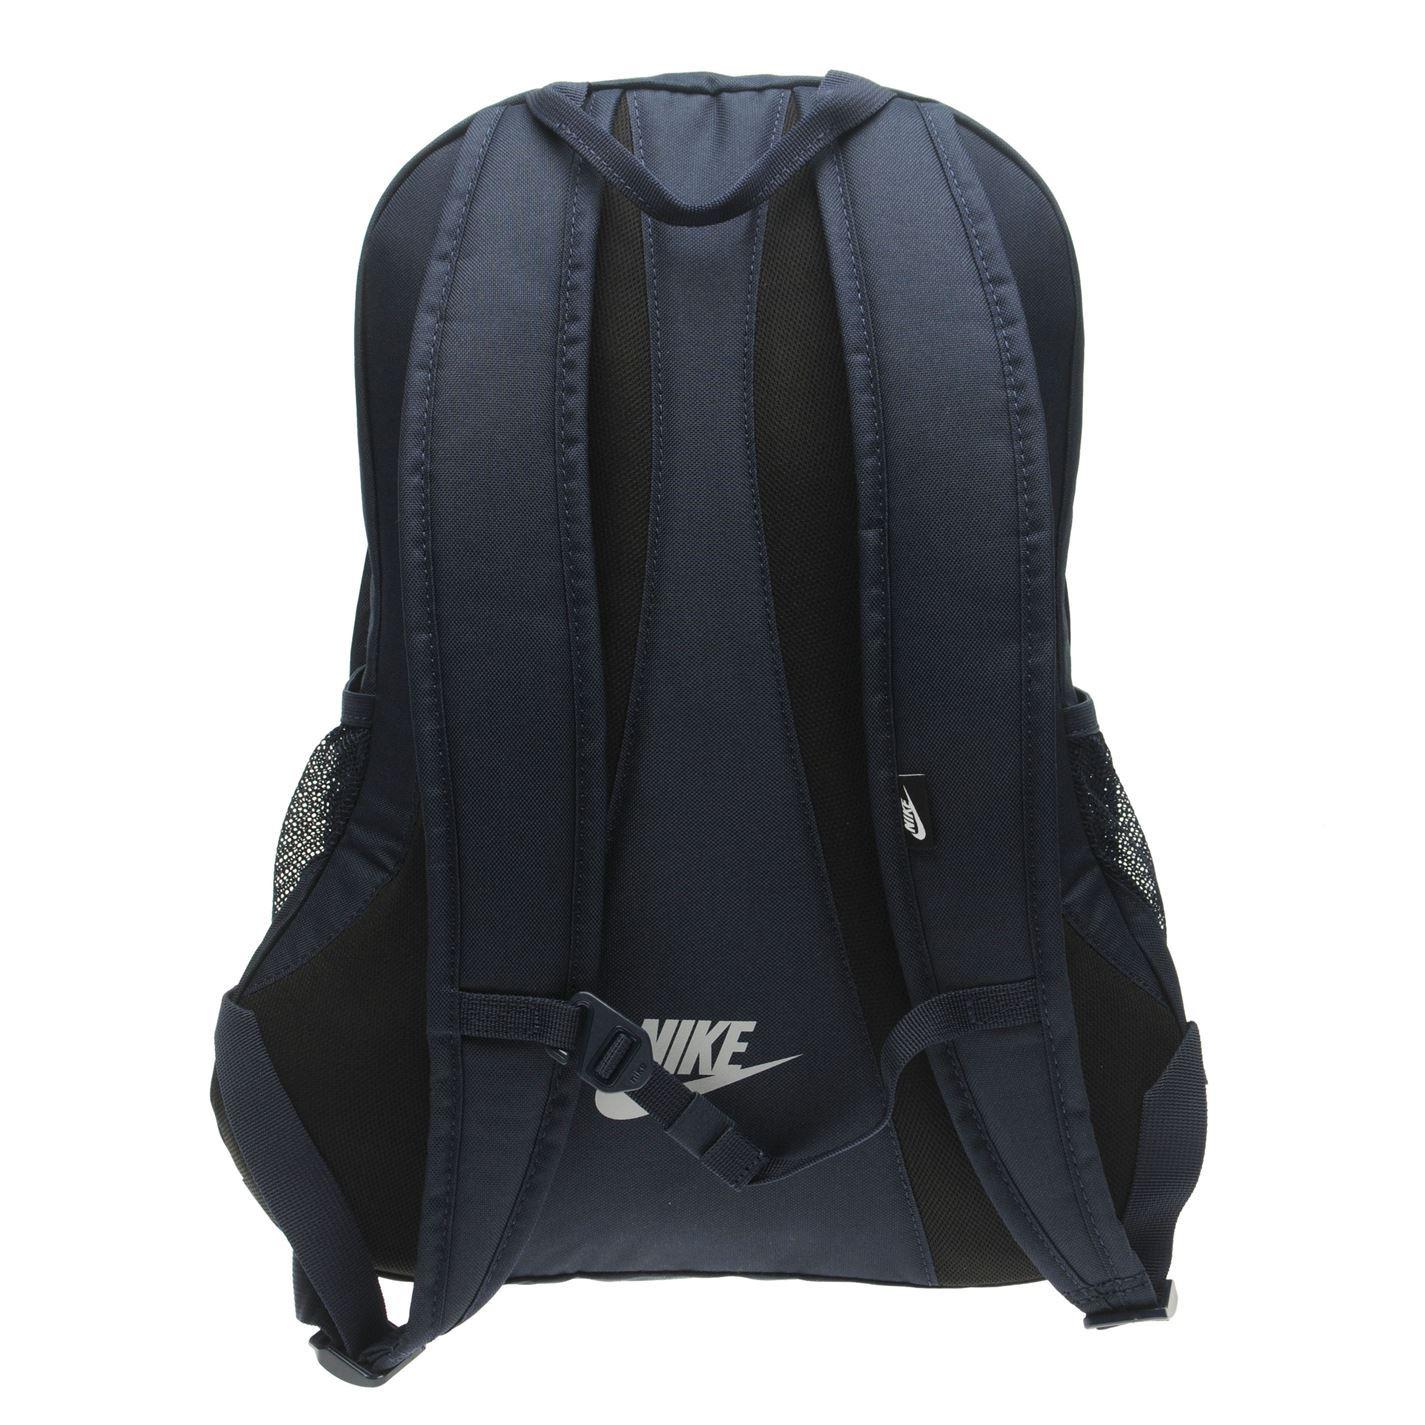 ... Nike Hayward Futura Backpack Navy Sports Bag Holdall Rucksack 883bcca5f99bc